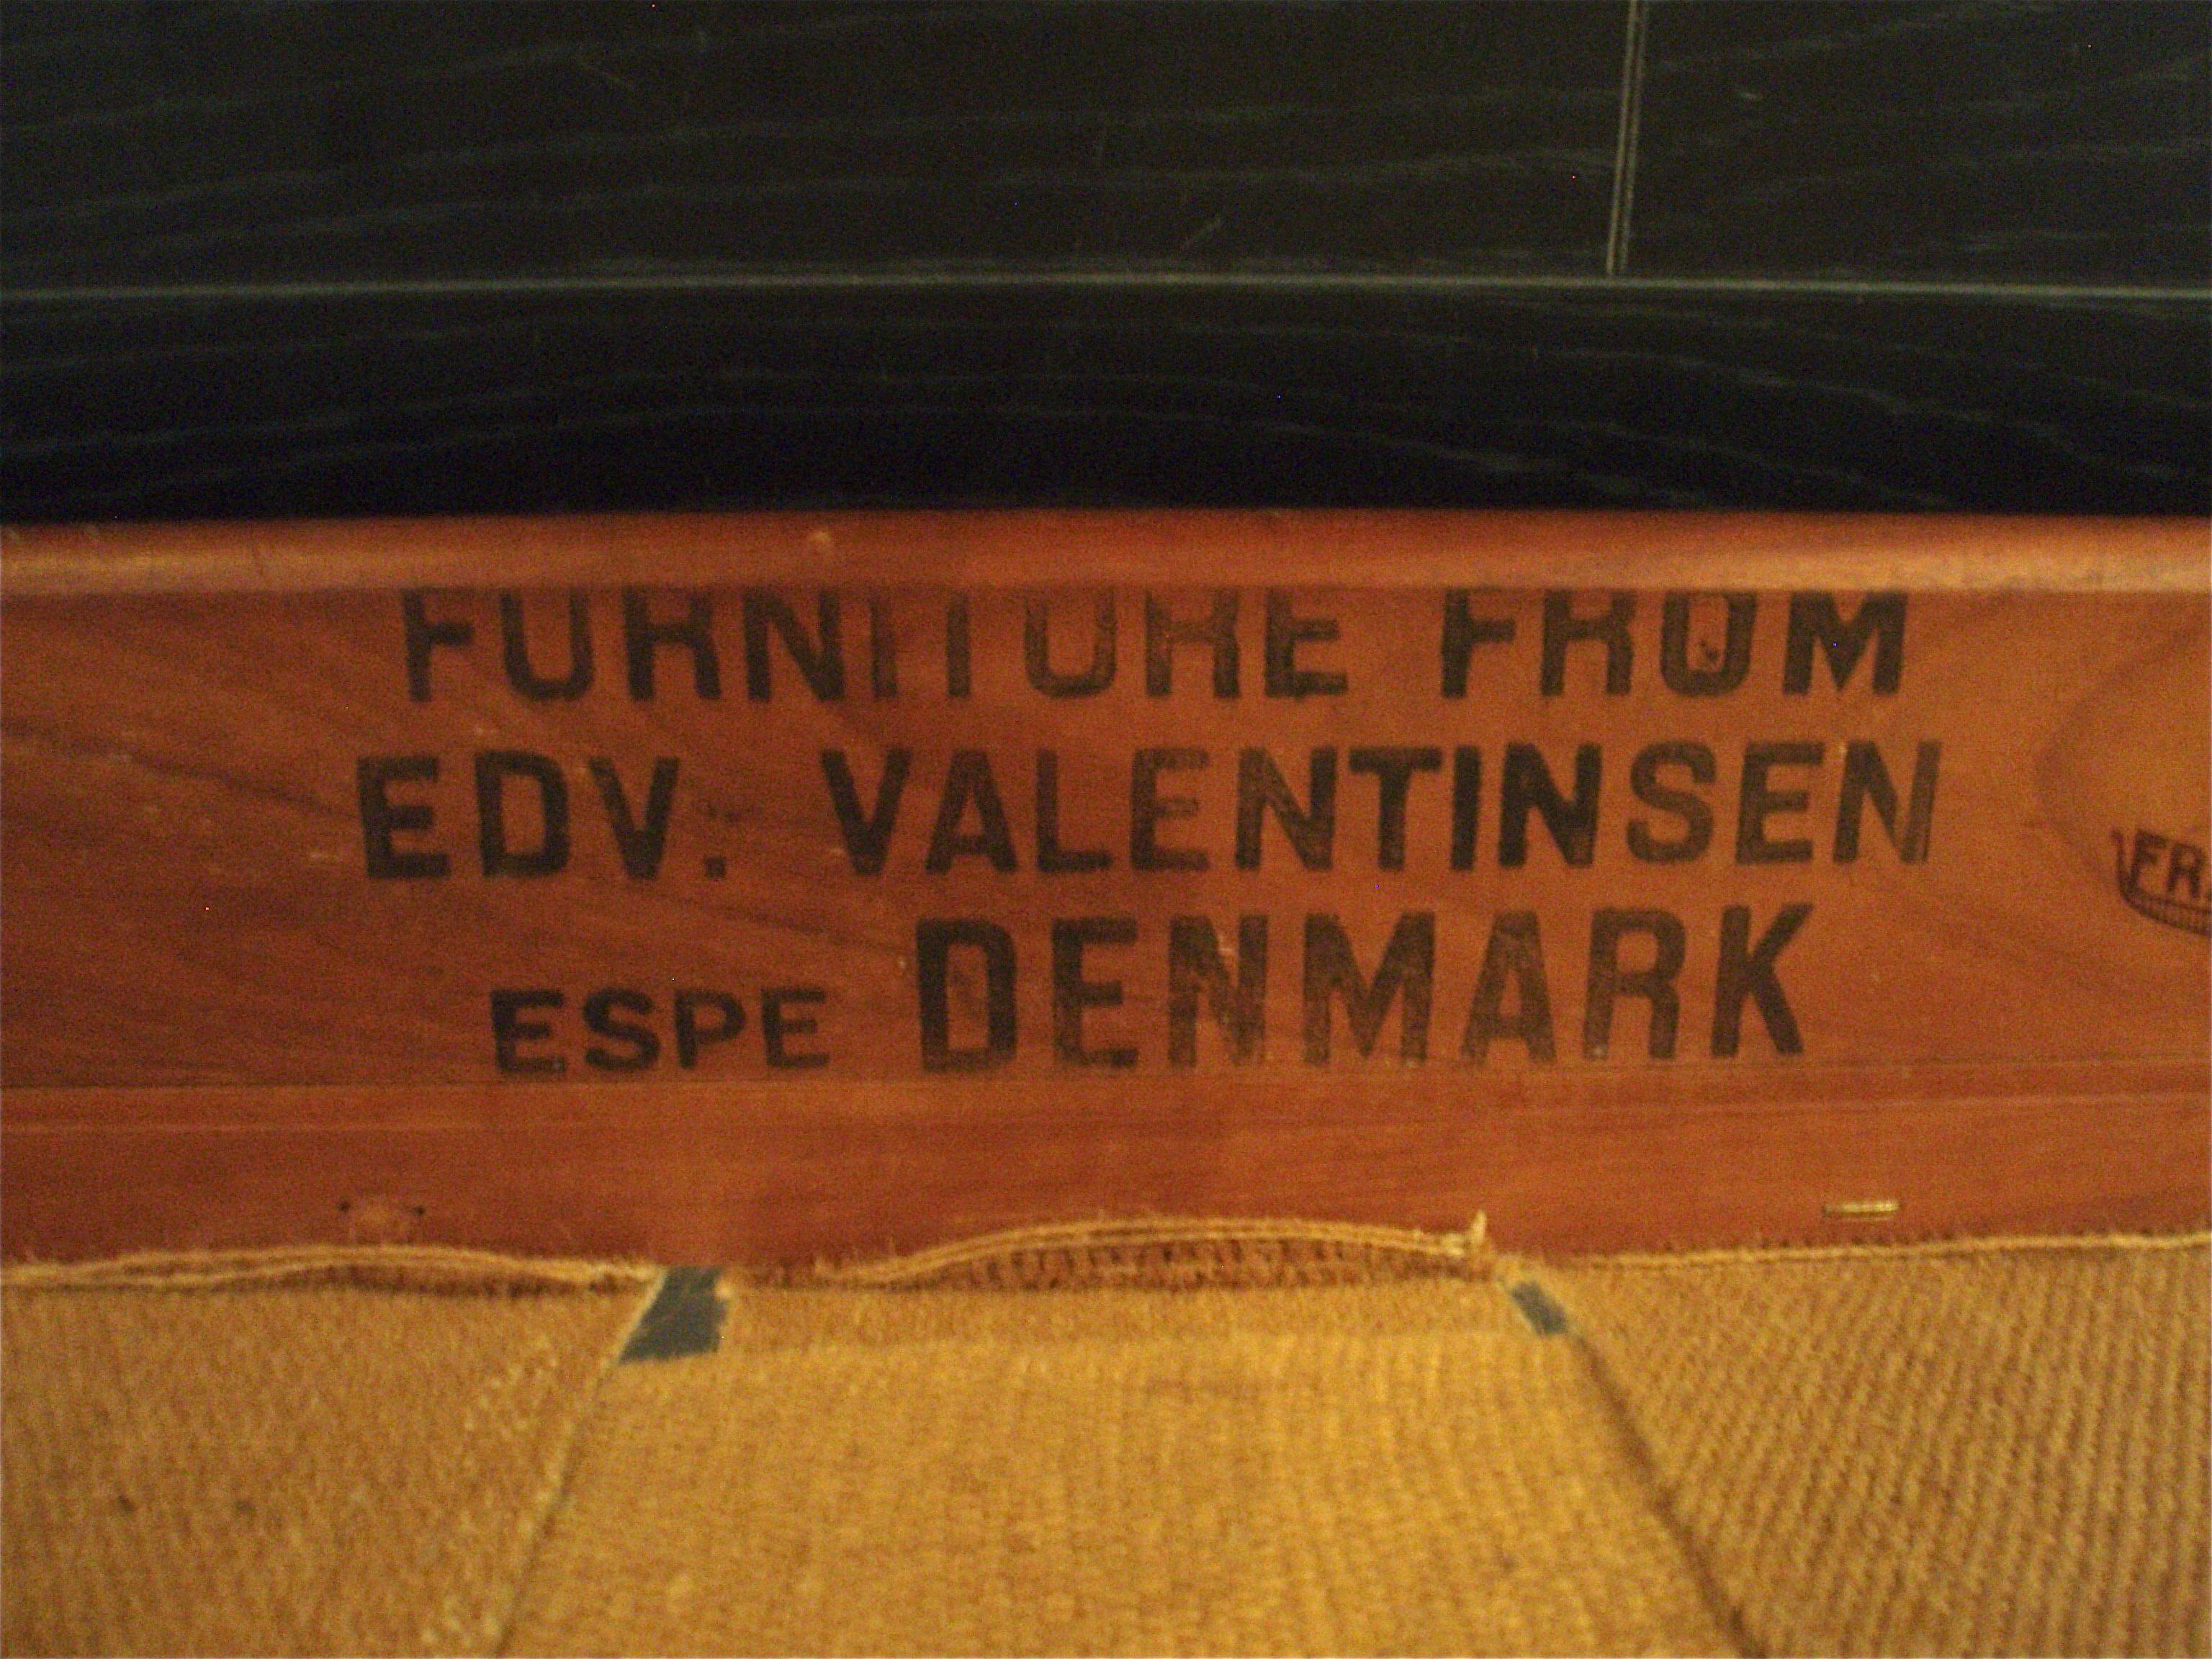 Fauteuils EDVARD VALENTINSEN